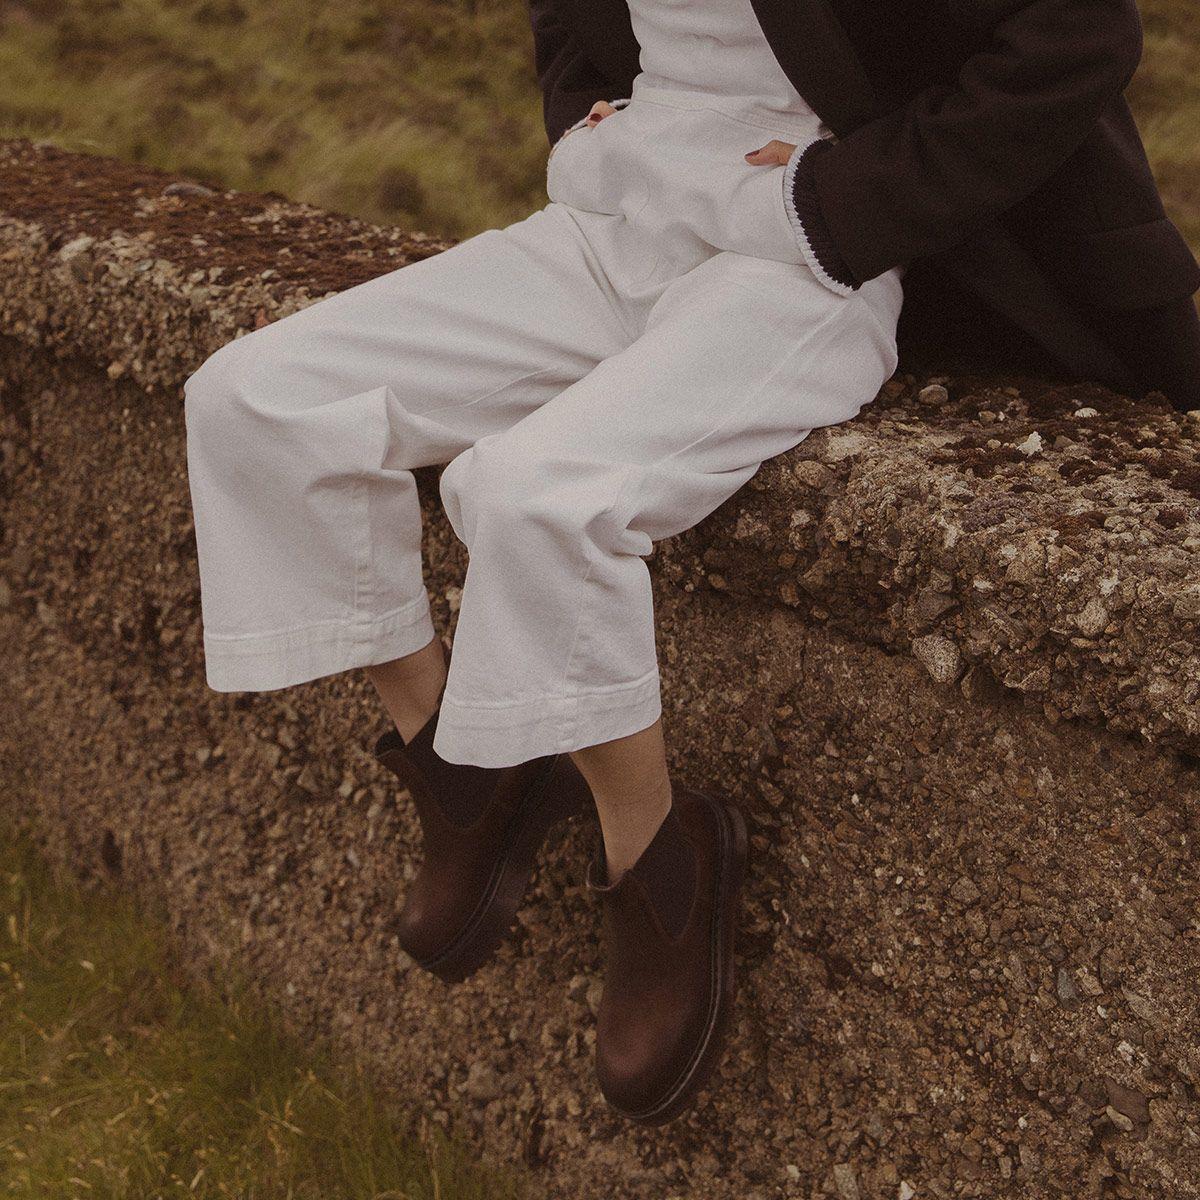 Bottines à plateforme Femme en cuir marron | Jonak